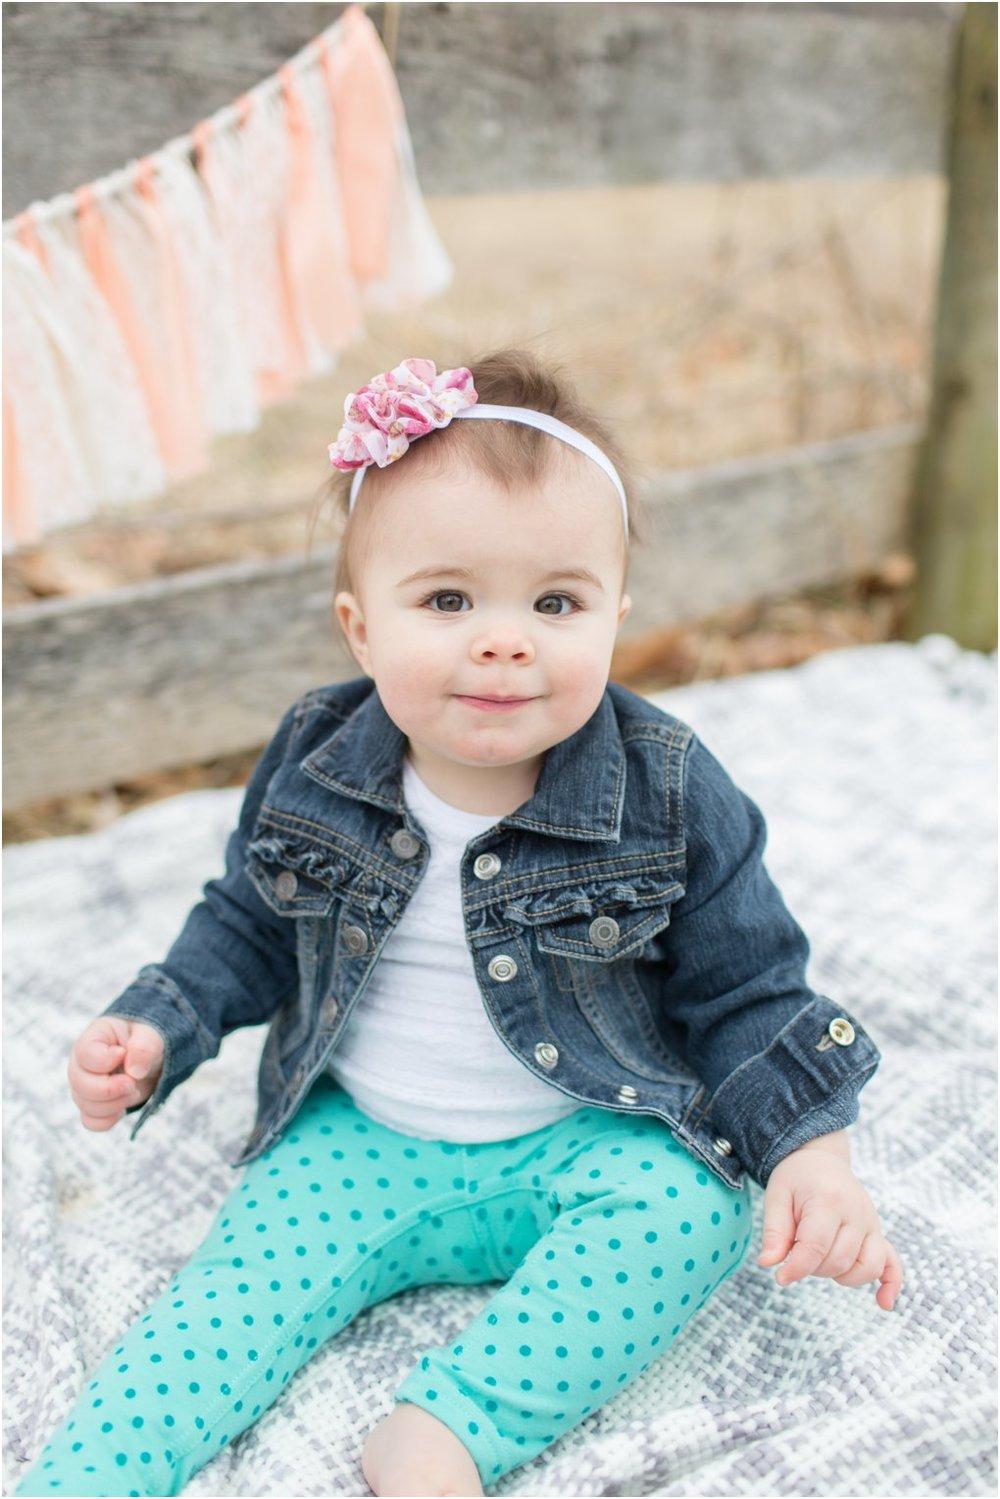 Baby-Layla-73.jpg